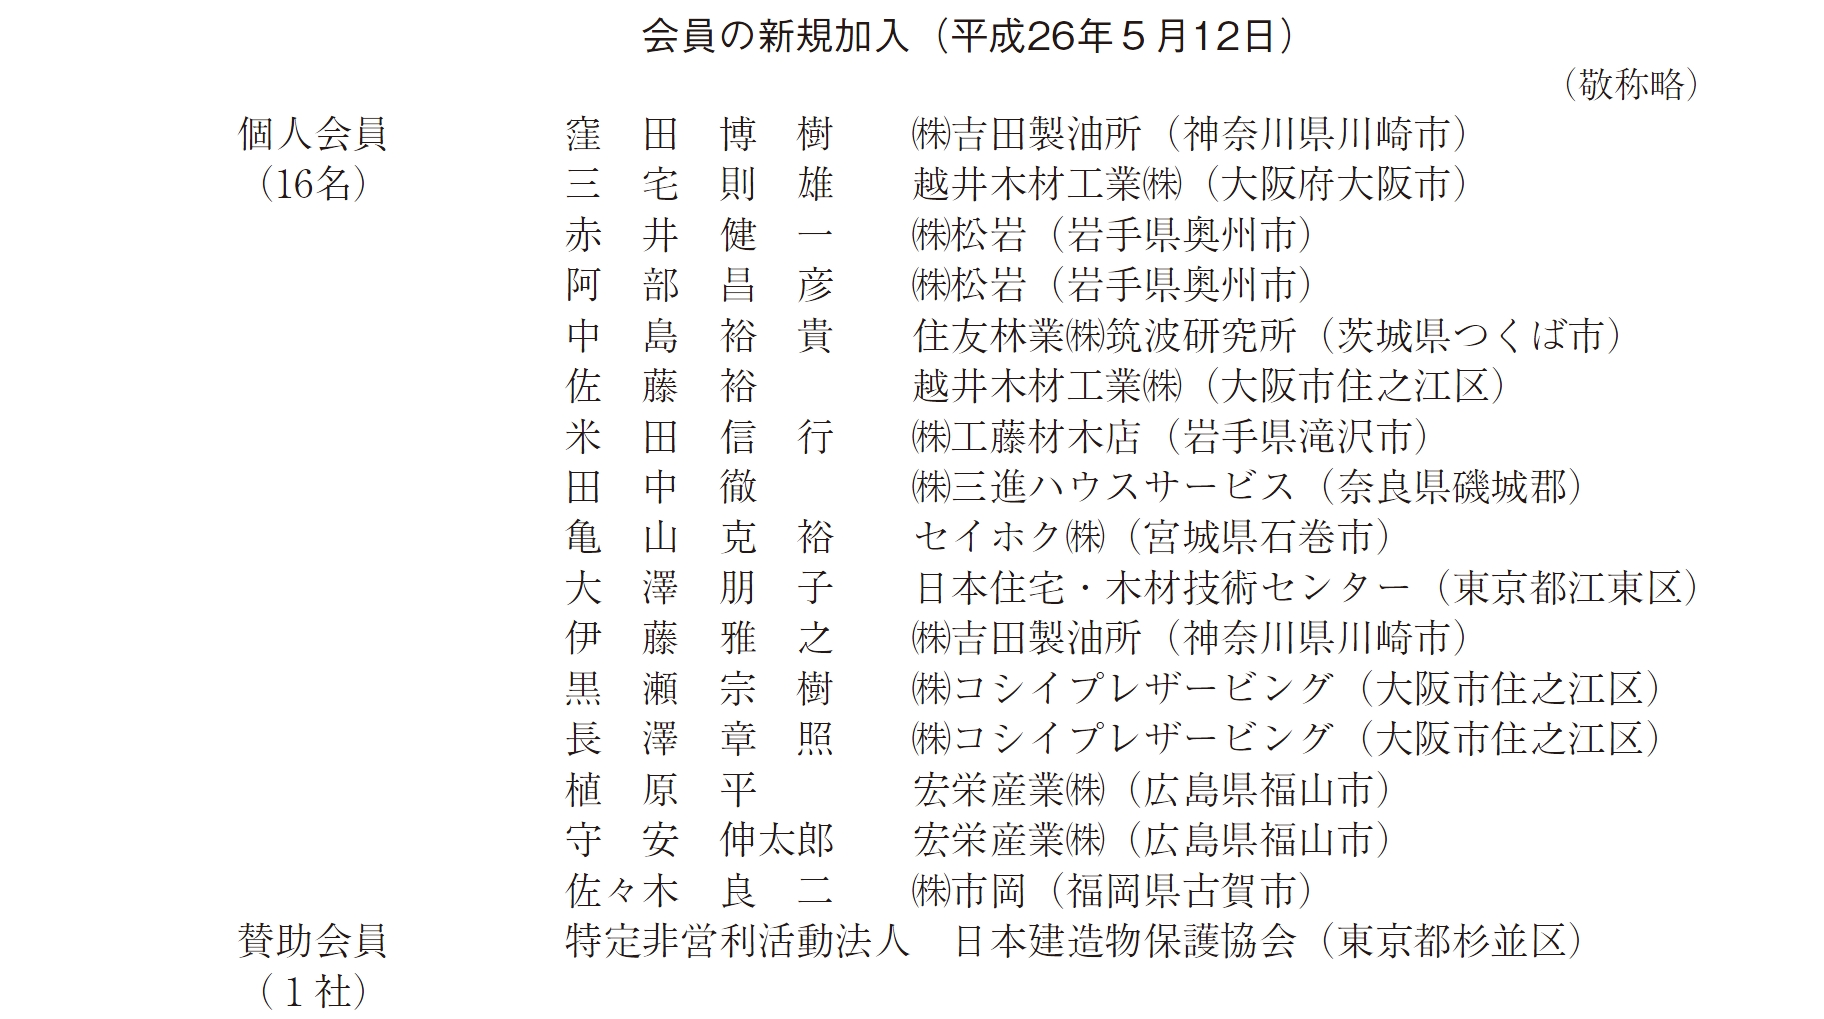 http://www.mokuzaihozon.org/about/jwpa_news/WS000000.JPG